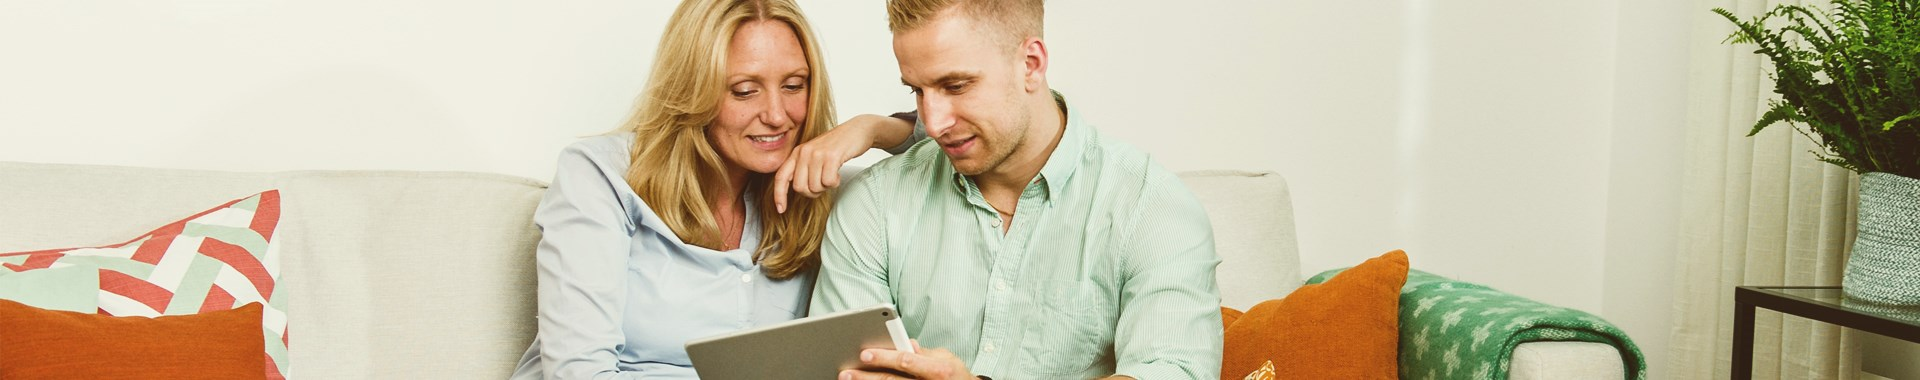 sivuston de rencontre eliitti dating